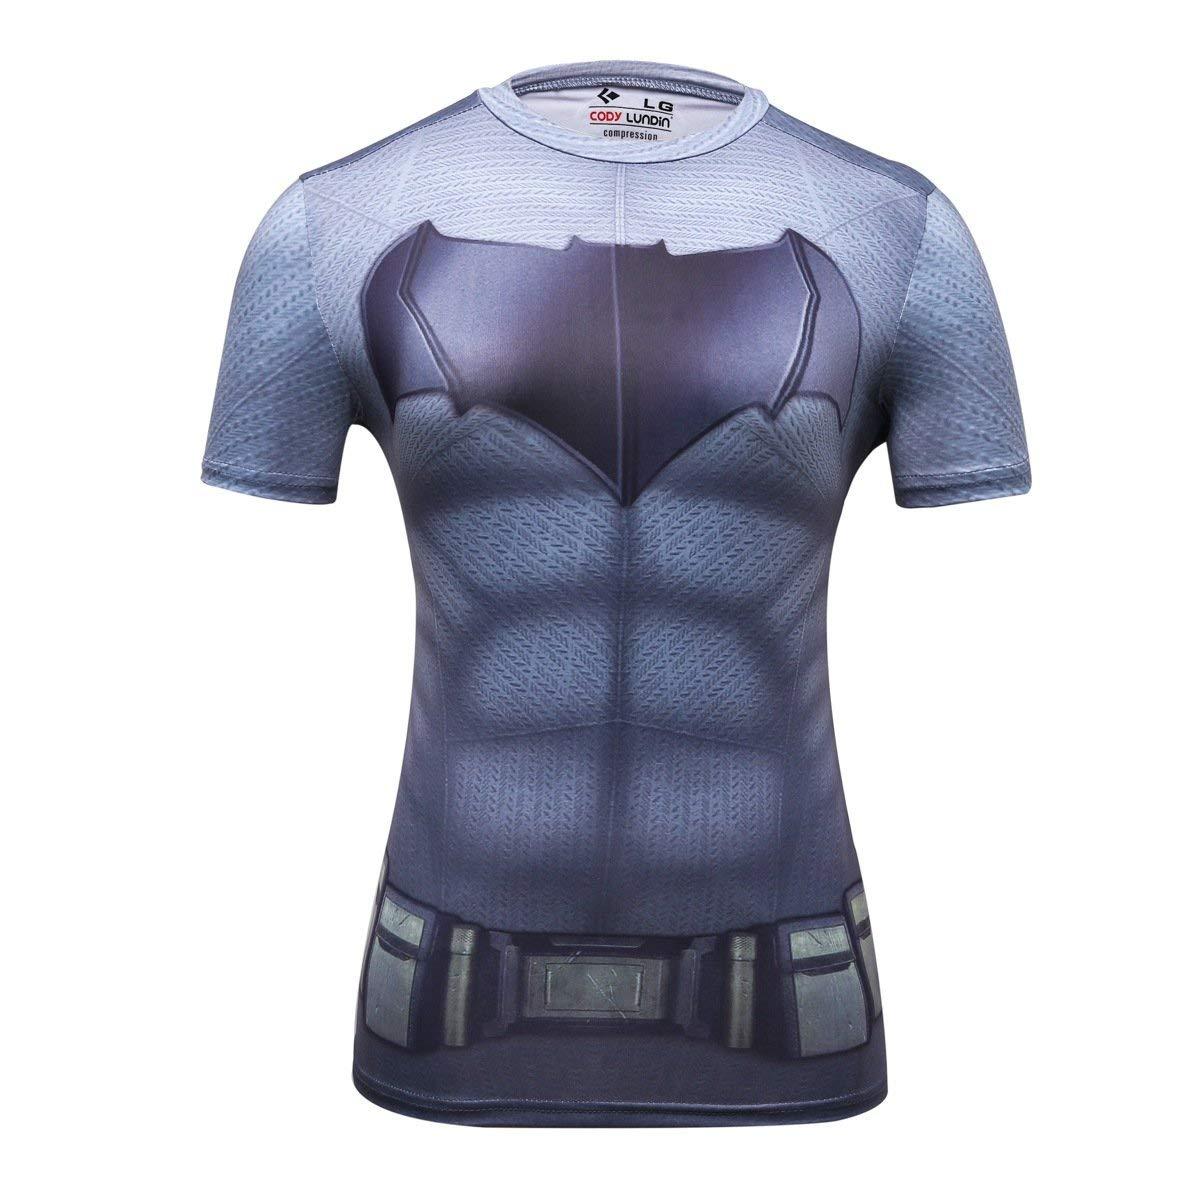 Women's Batman superhero compression shirt